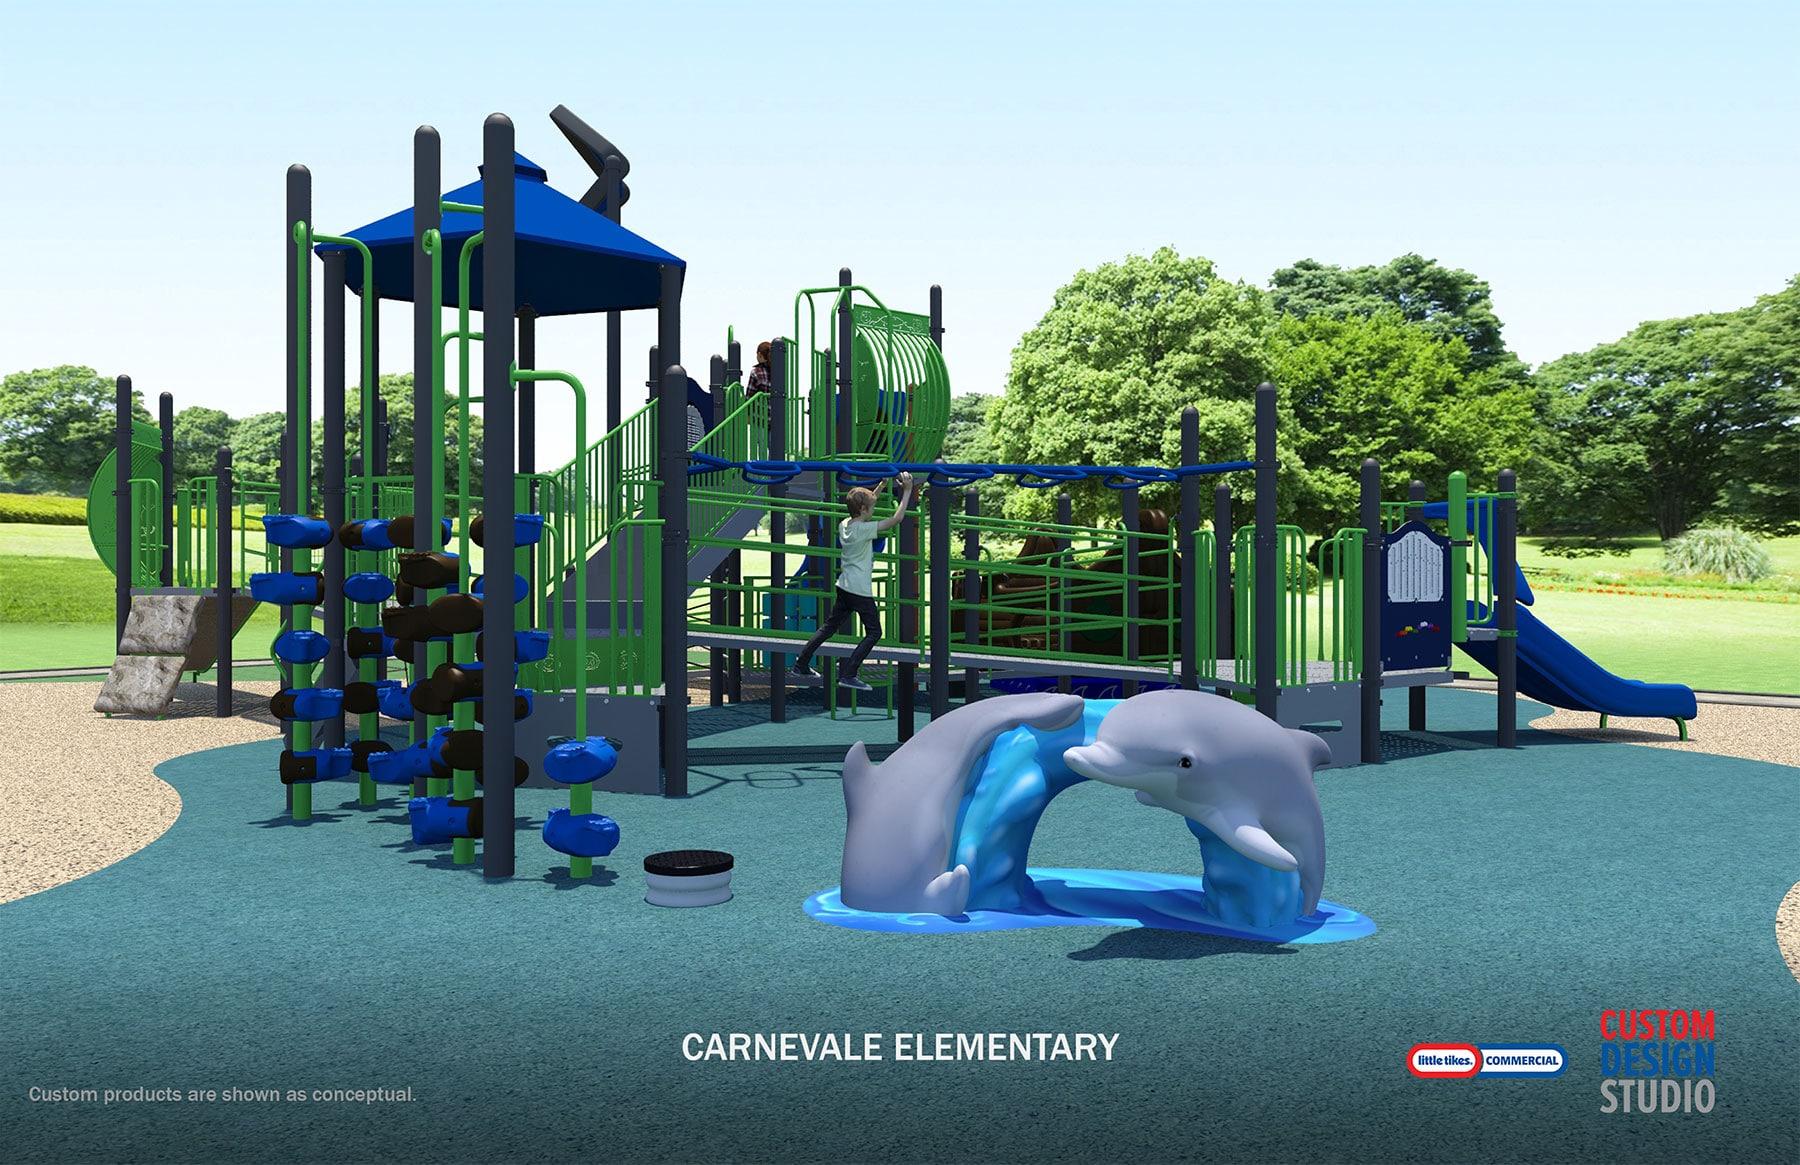 Carnevale Playground